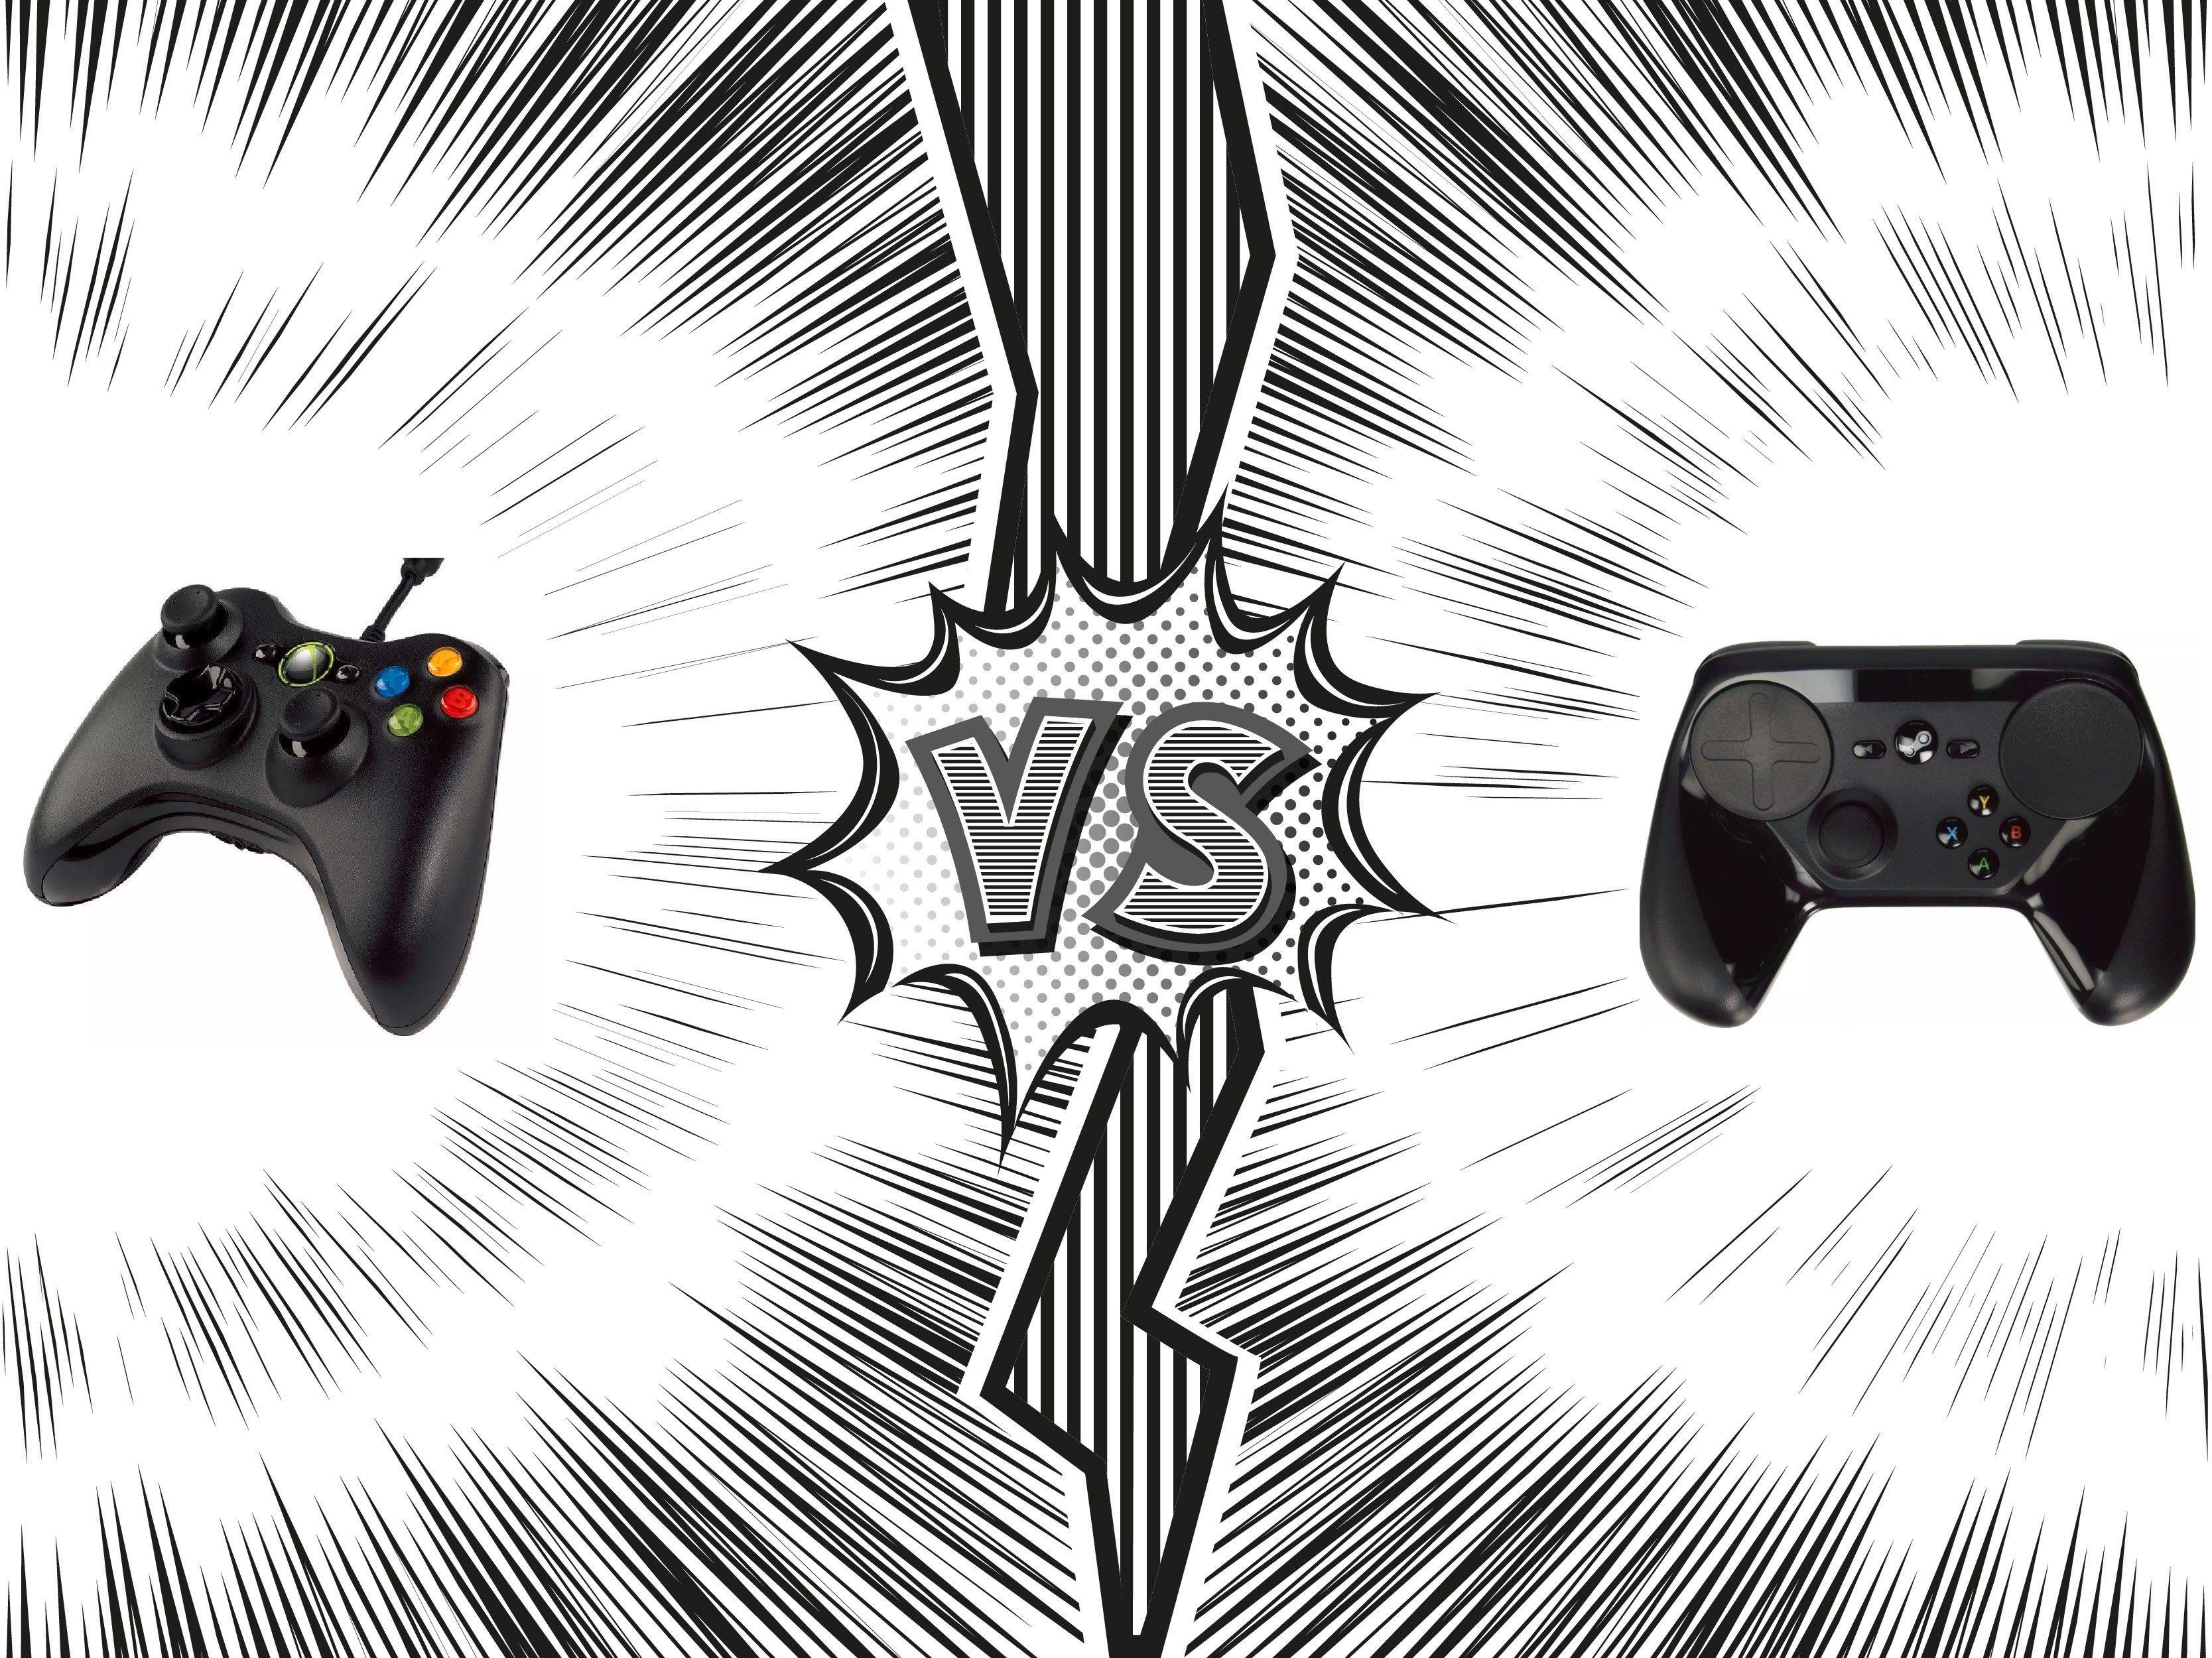 Steam Controller Vs Microsoft Xbox 360 Wired Controller